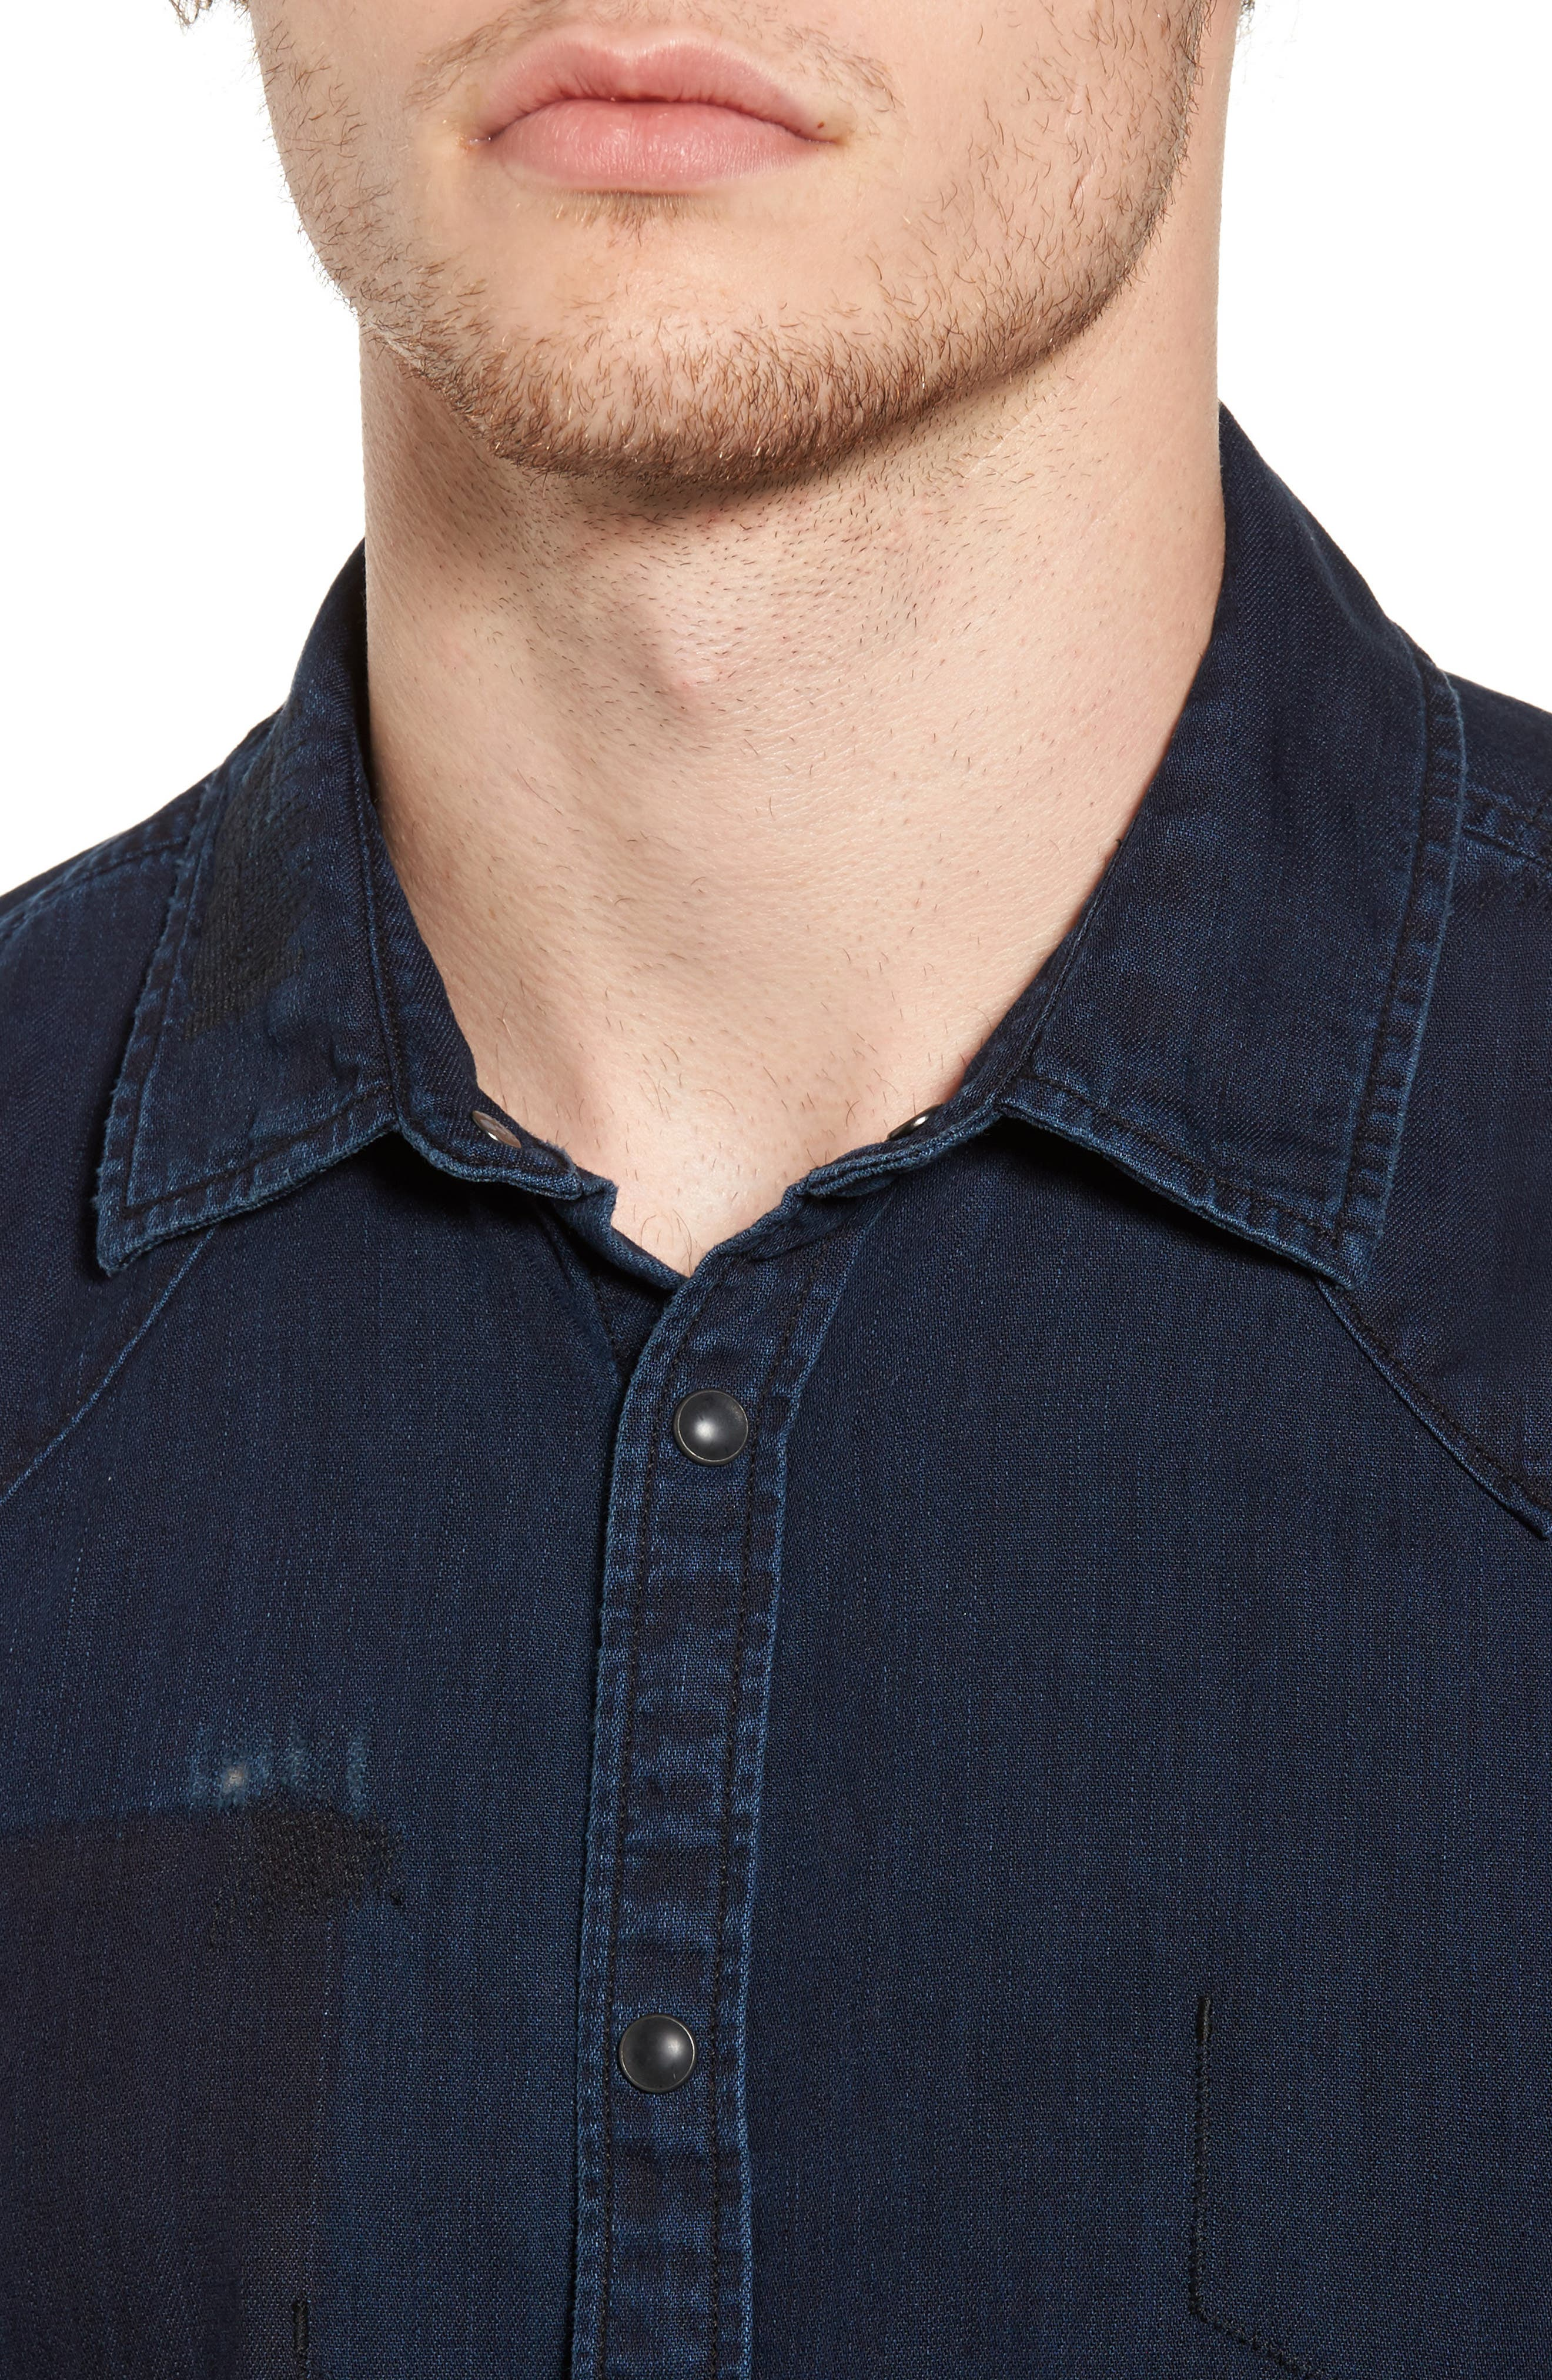 Pocketless Western Denim Shirt,                             Alternate thumbnail 4, color,